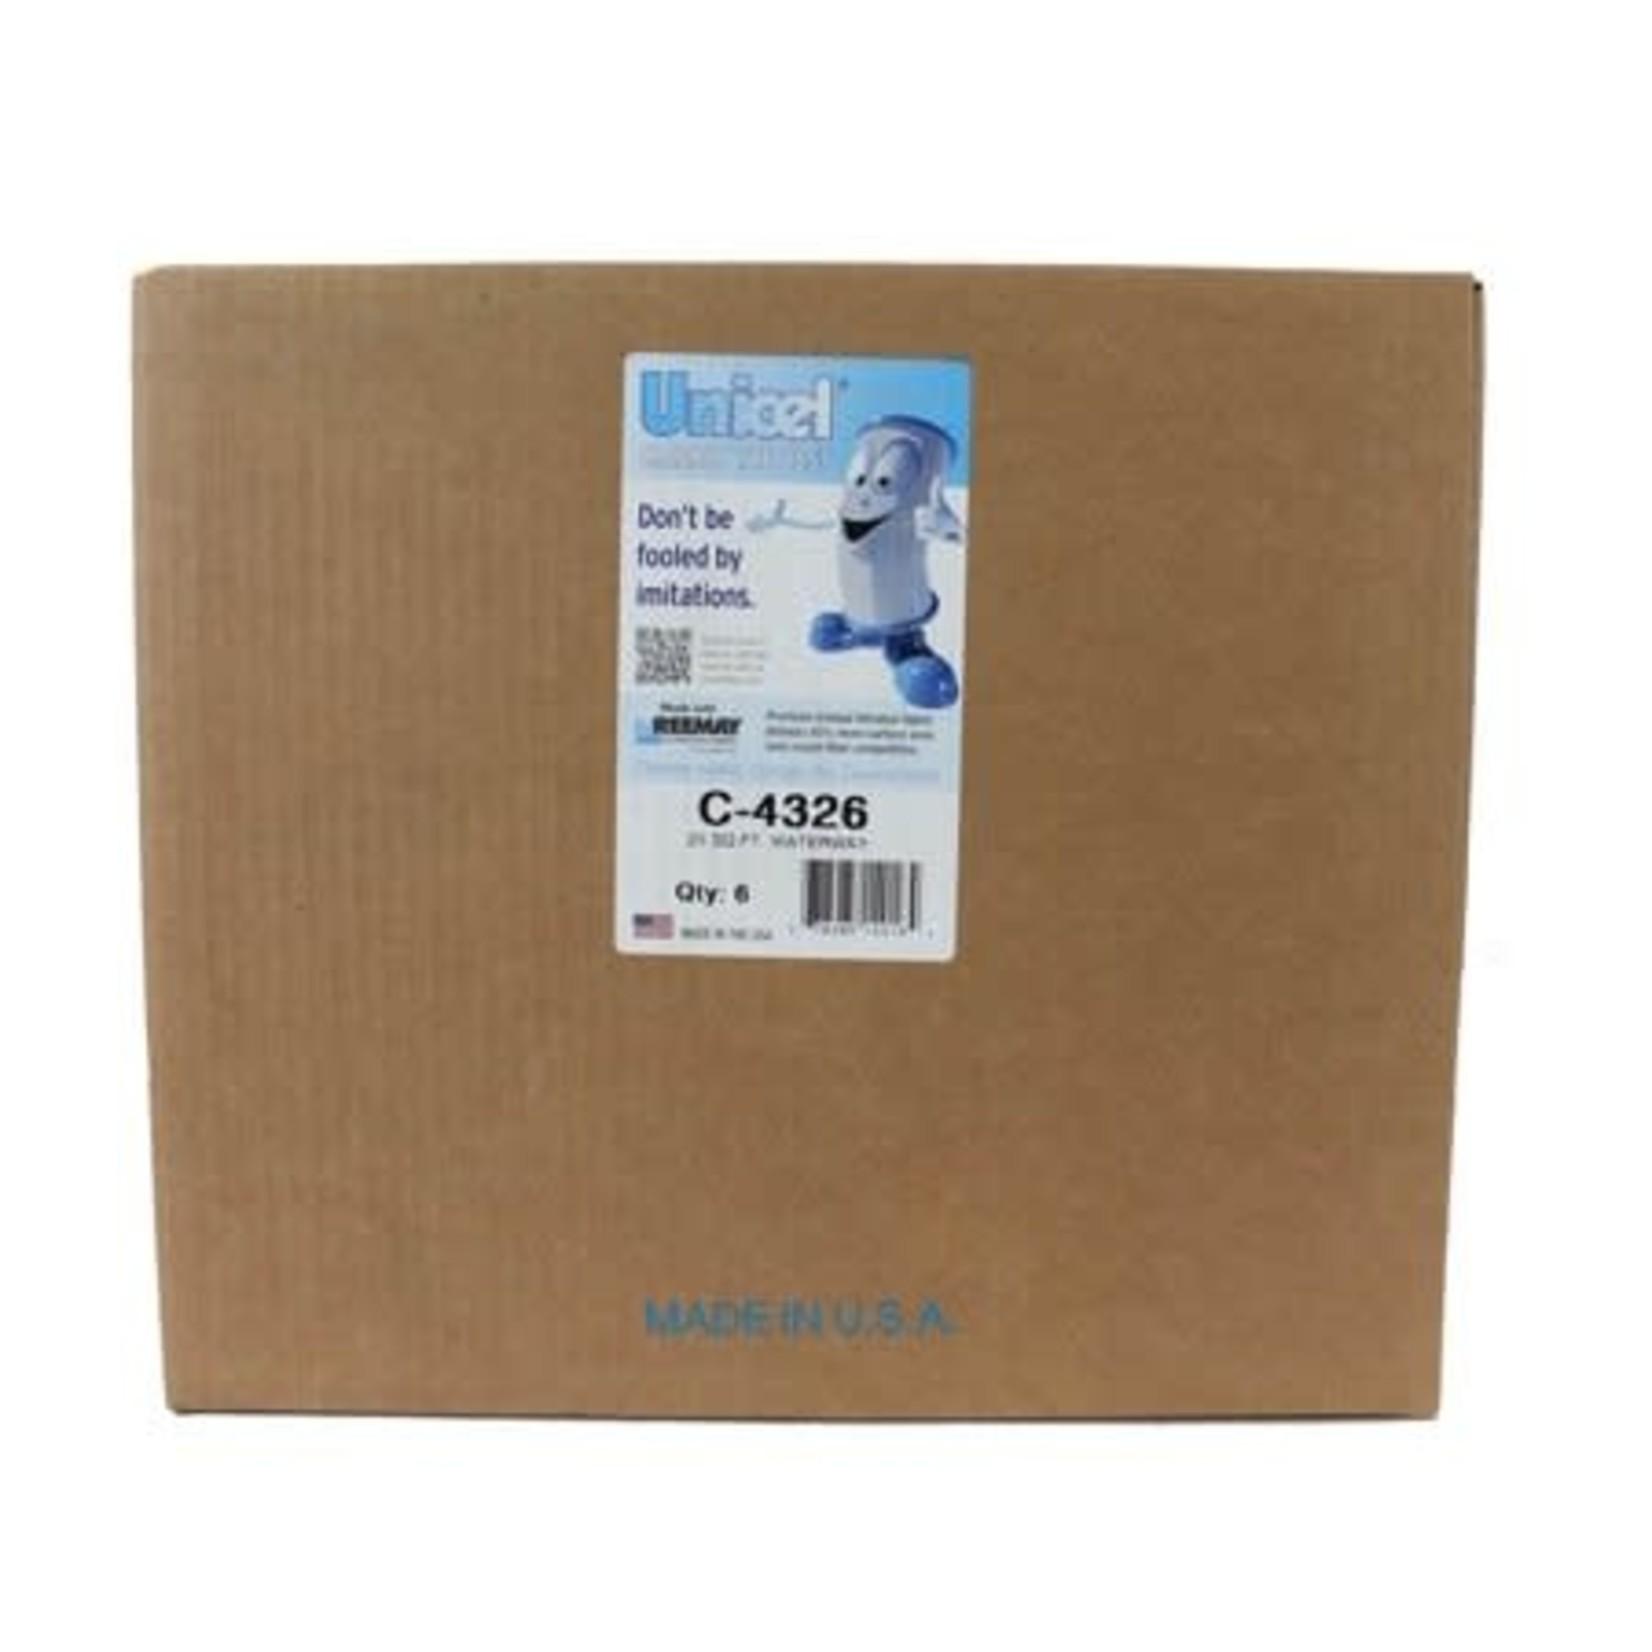 Unicel CARTRIDGE SPA C4326